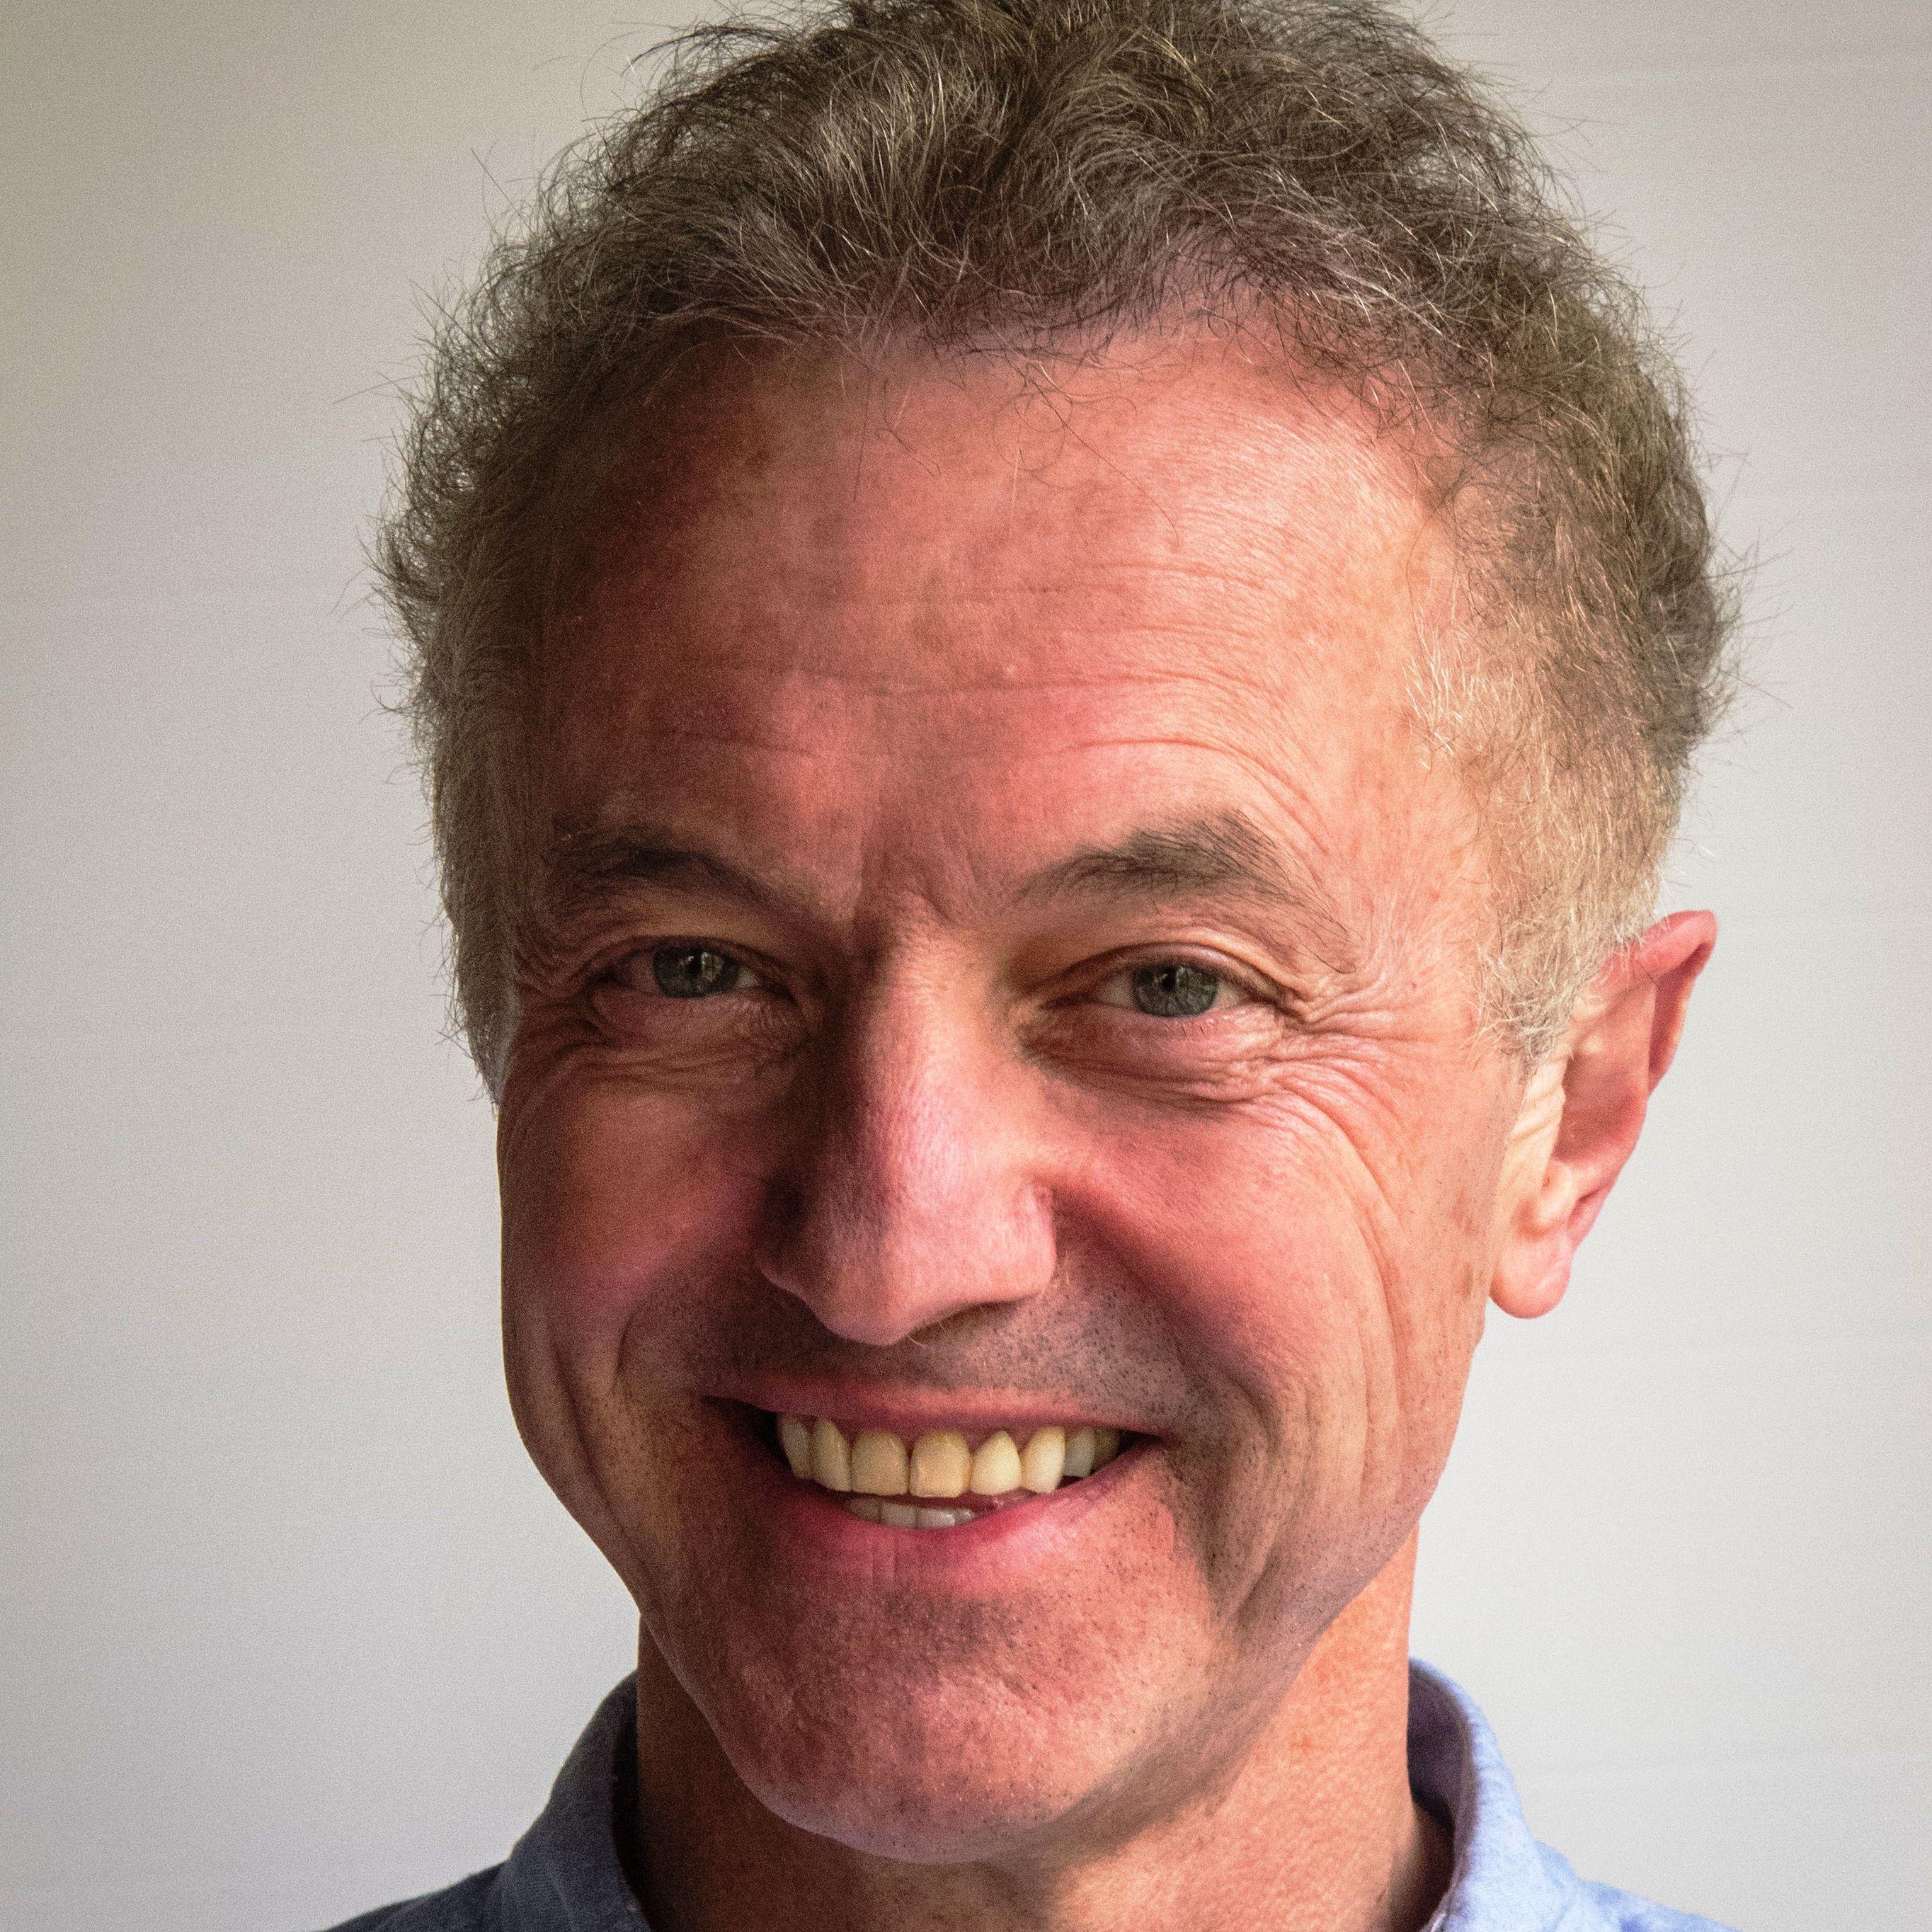 Adrian Raine, the Richard Perry University Professor of Criminology, Psychology and Psychiatry